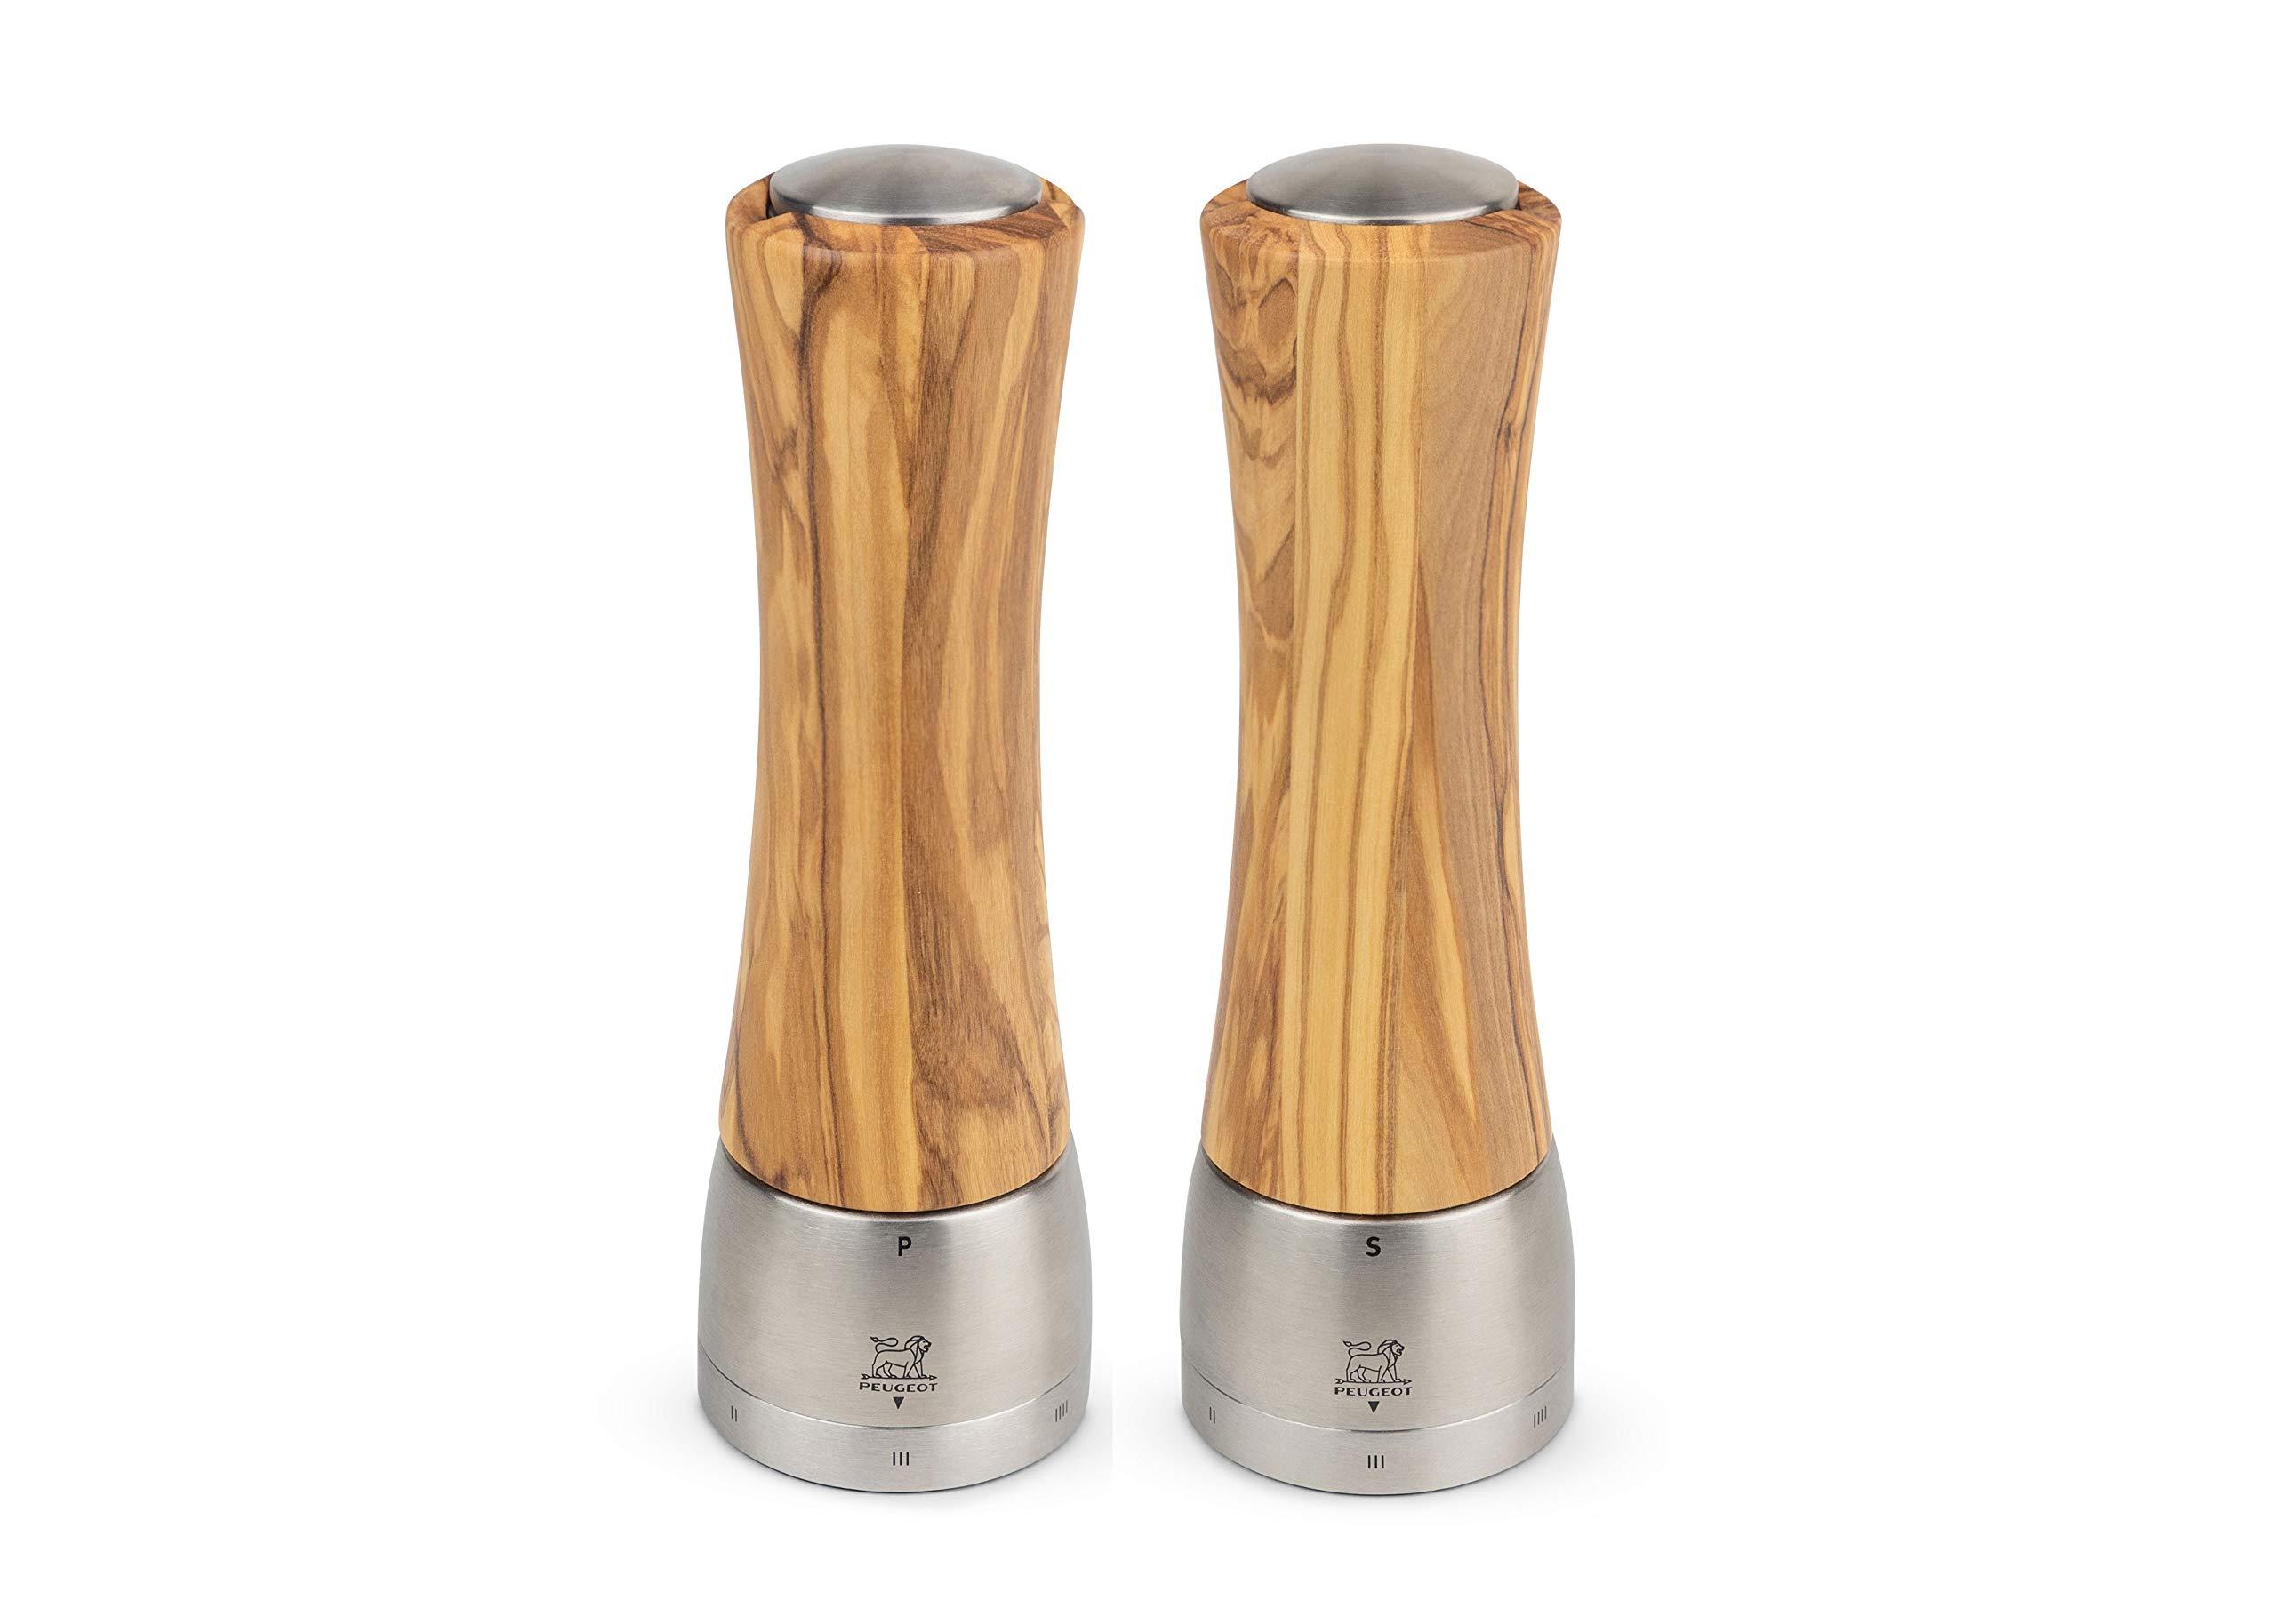 Peugeot Madras u'Select Olive Wood Mill Pepper & Salt Mill Set, 6-in by Peugeot Saveurs SNC